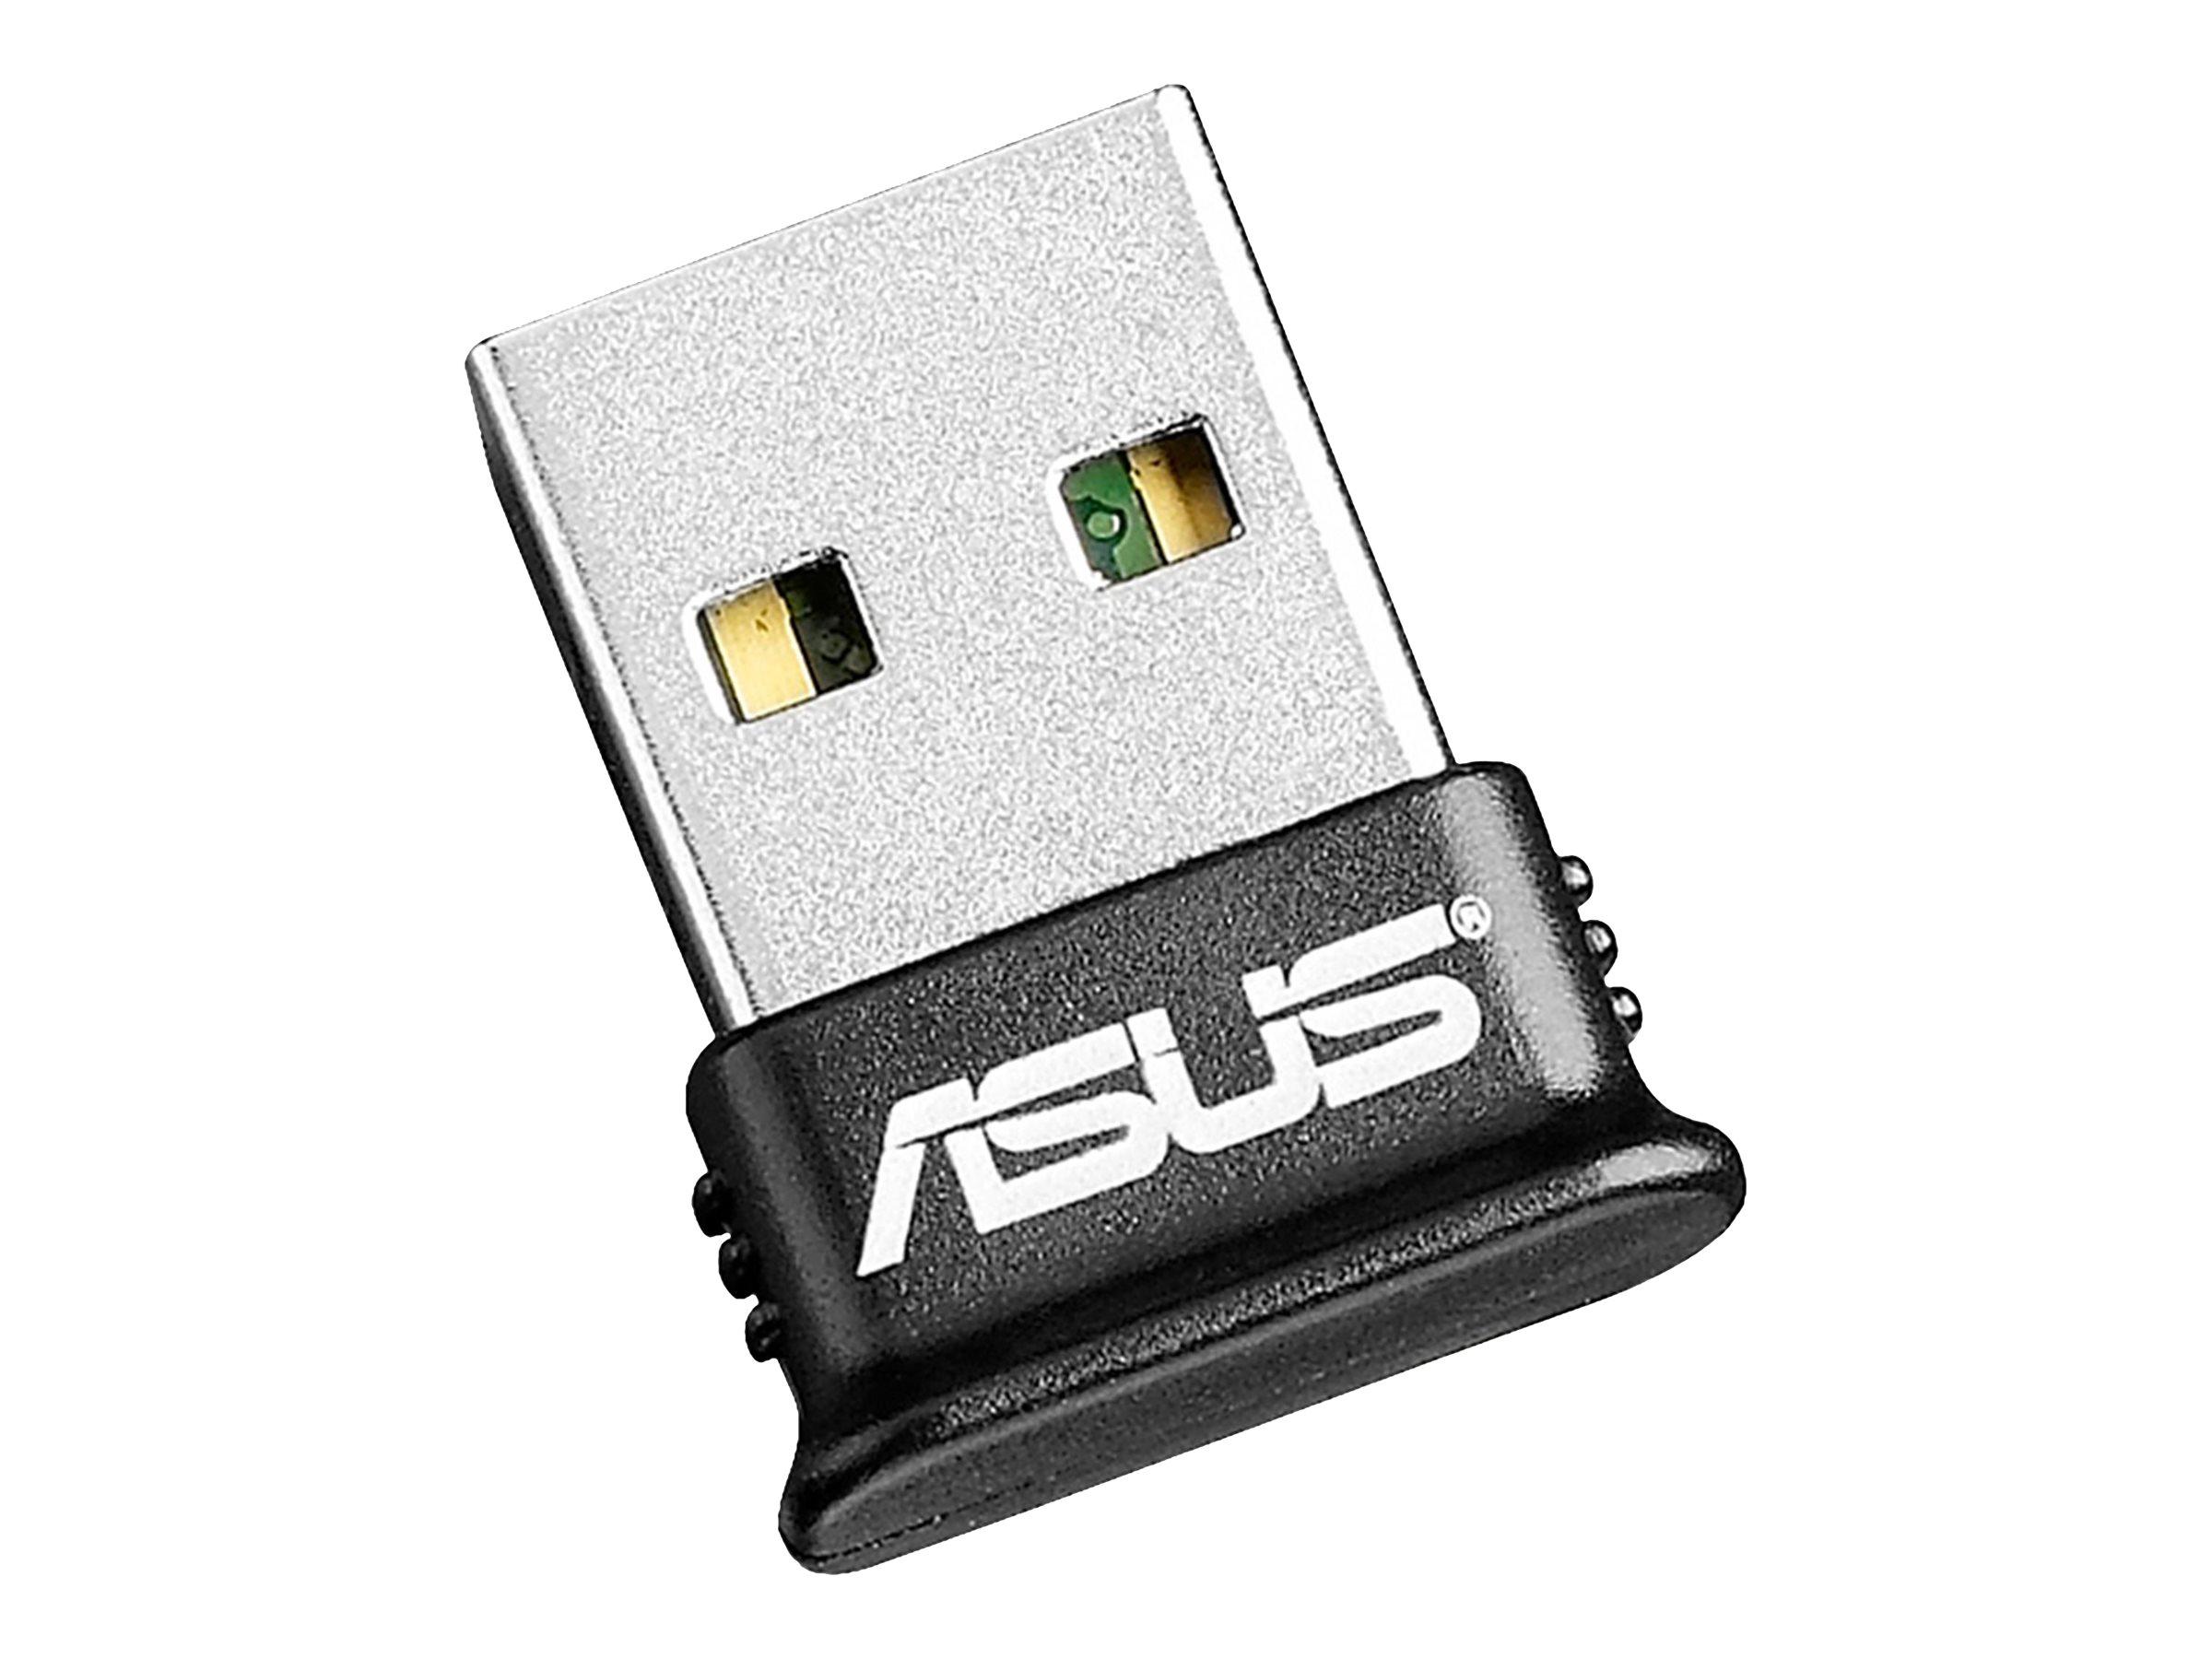 ASUS USB-BT400 - network adapter - USB 2.0